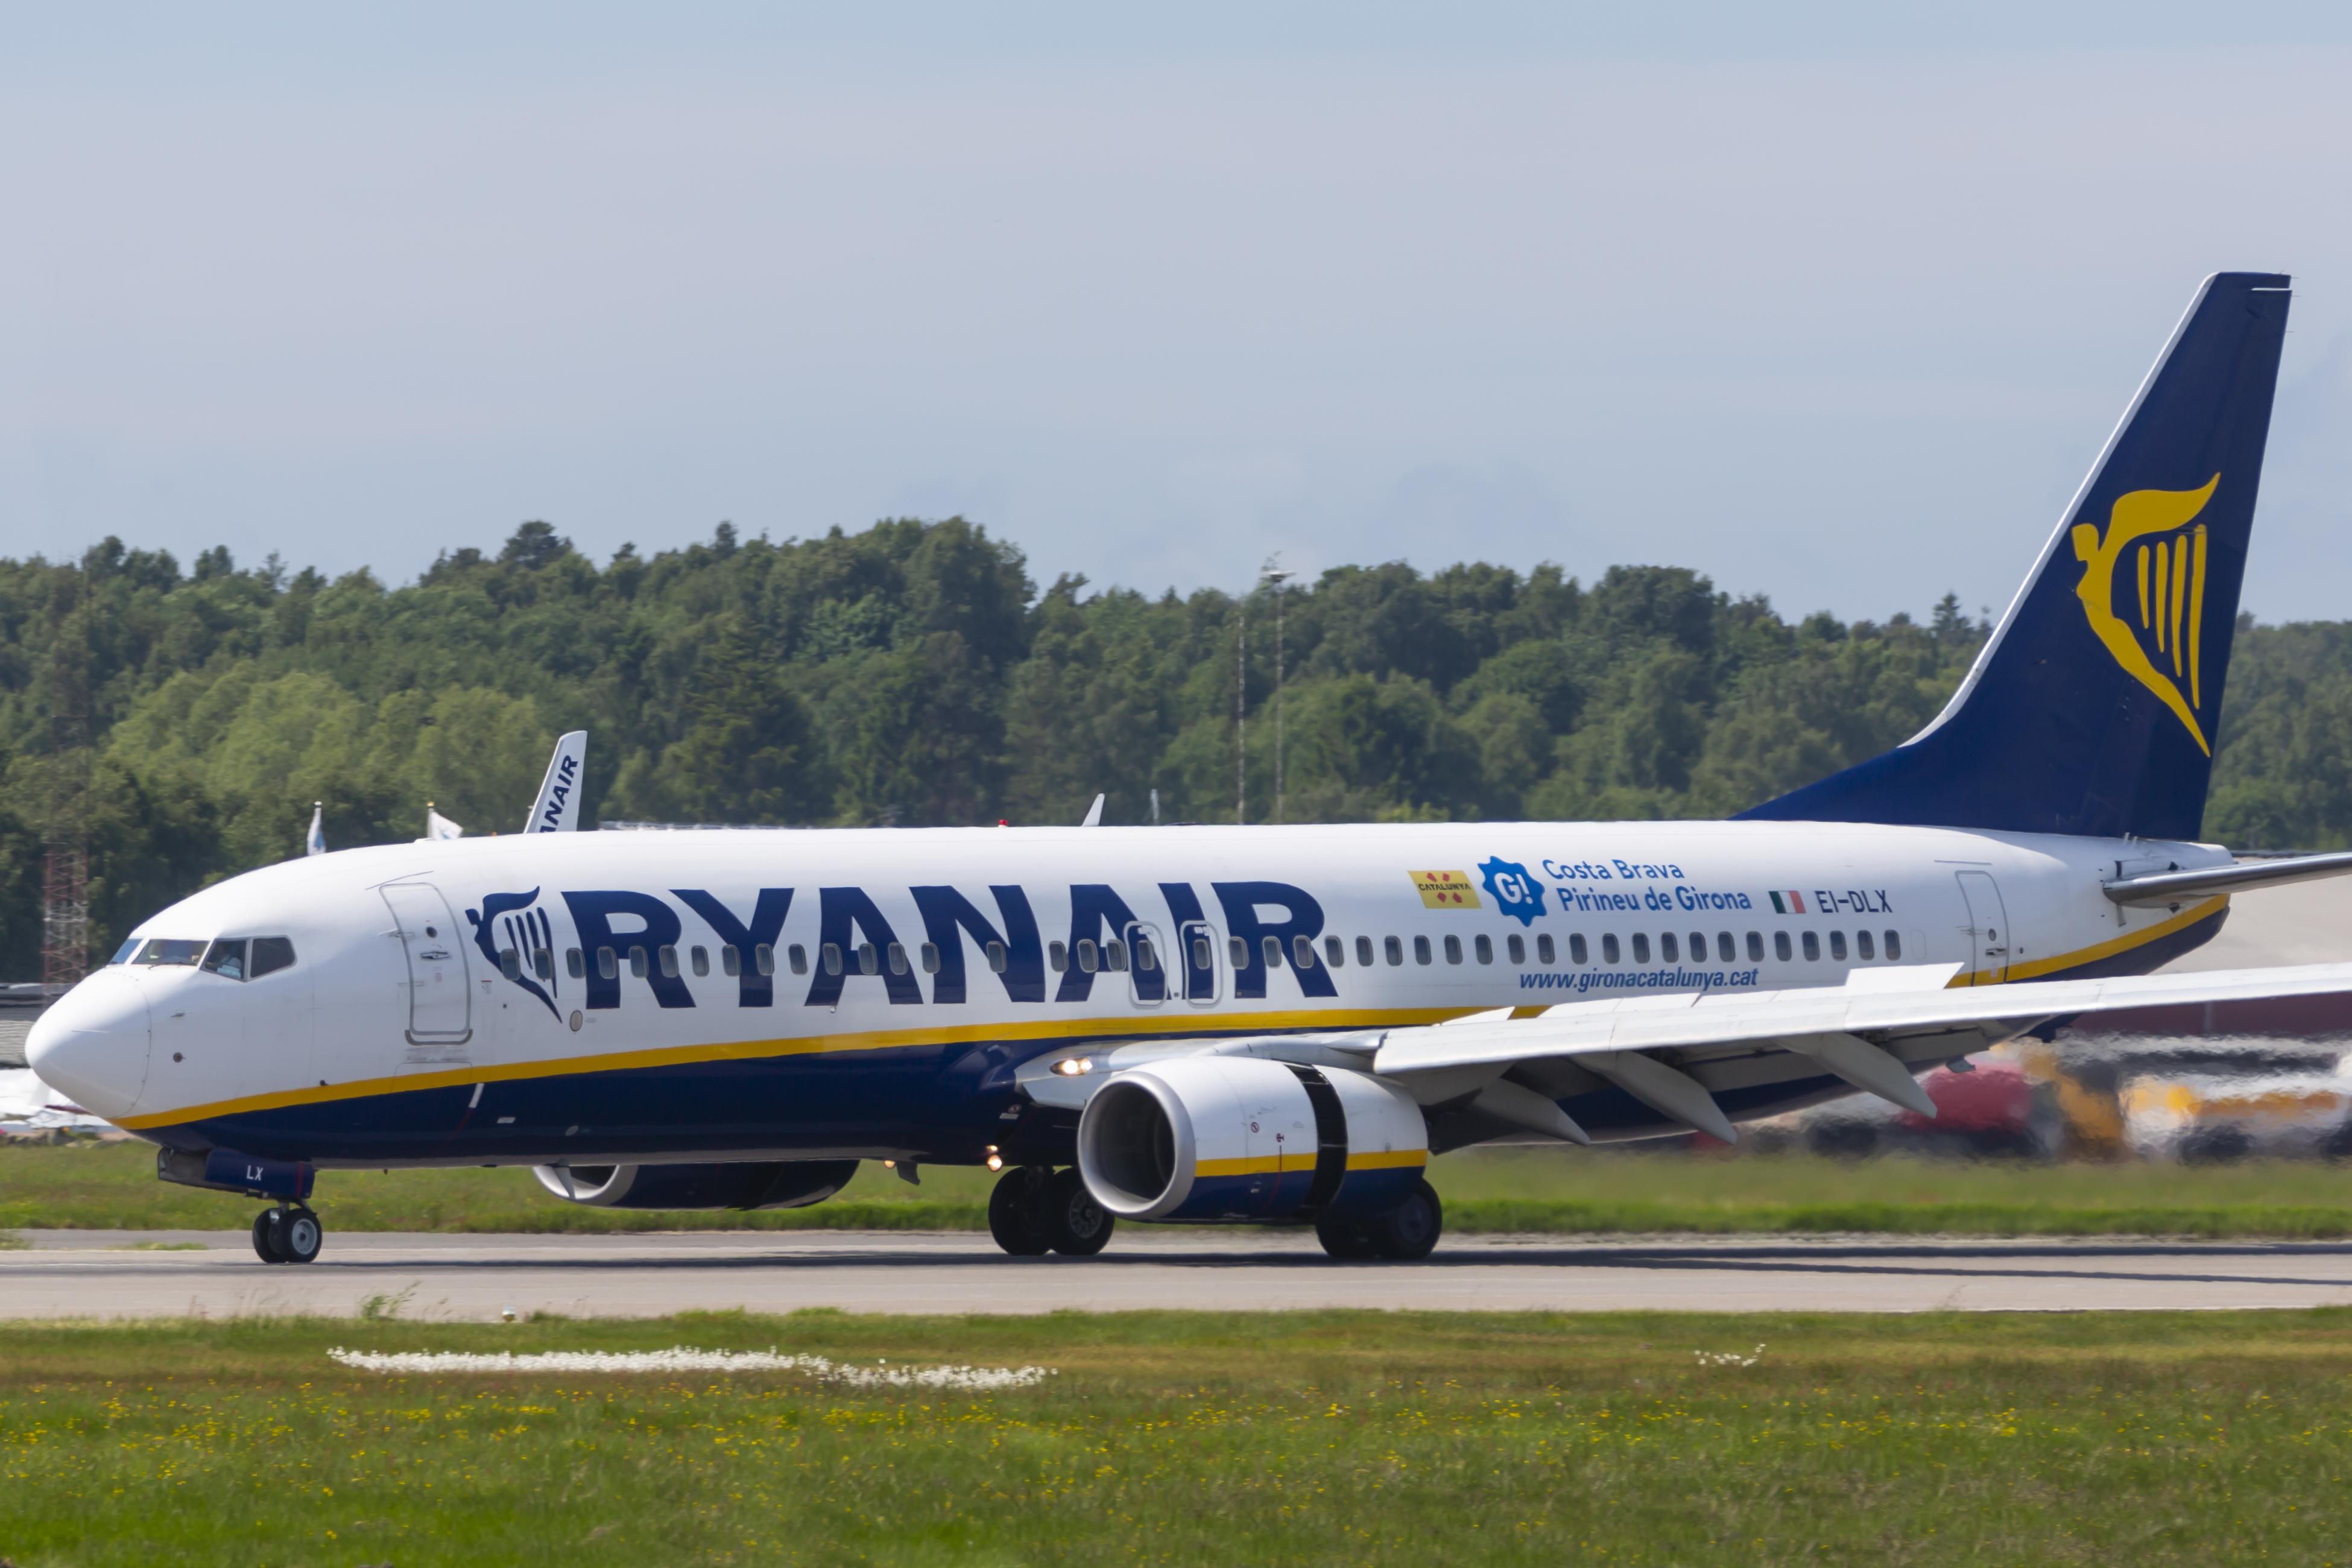 En Boeing 737-800 fra Ryanair. Foto: © Thorbjørn Brunander Sund, Danish Aviation Photo